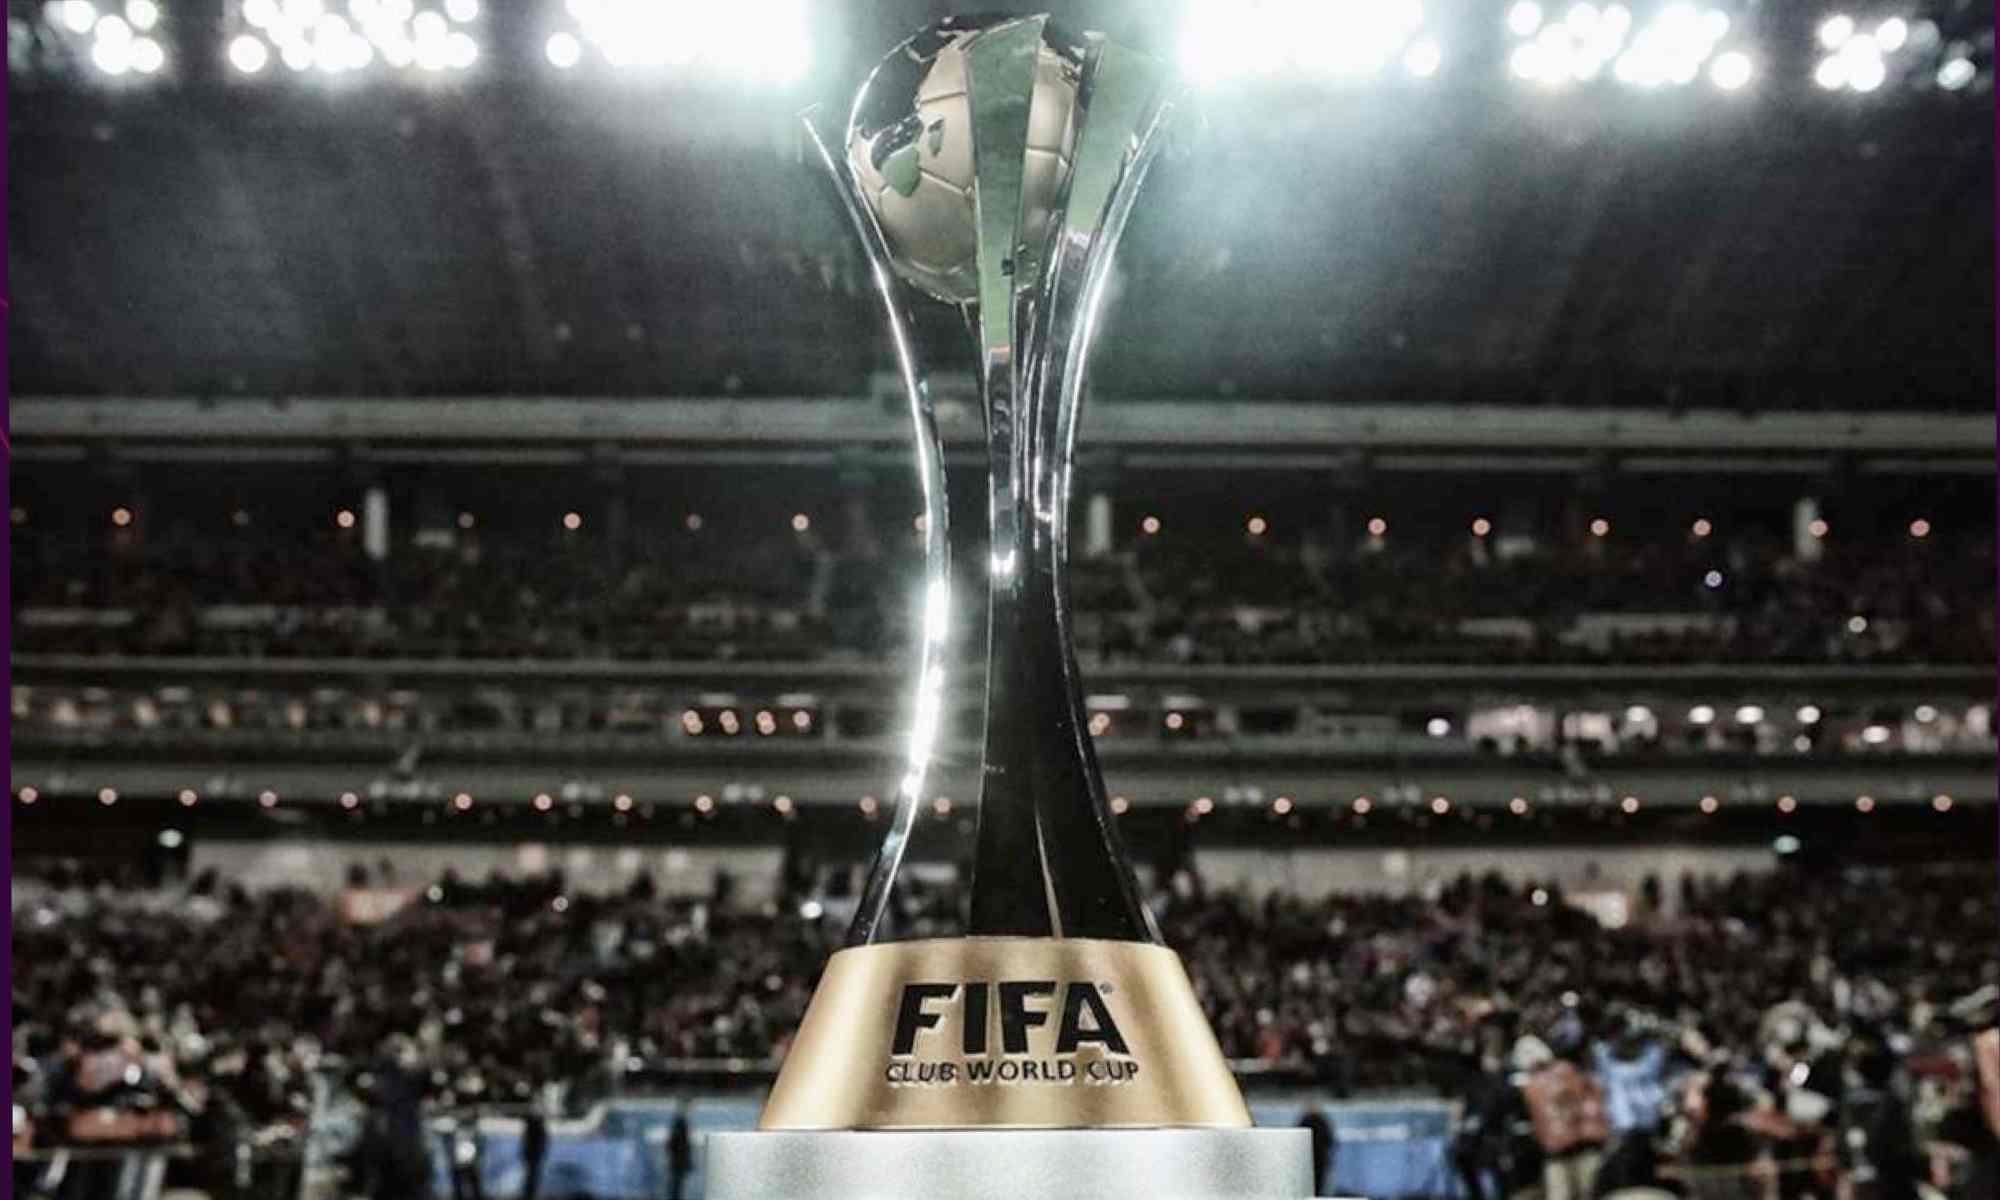 world cup club trophee